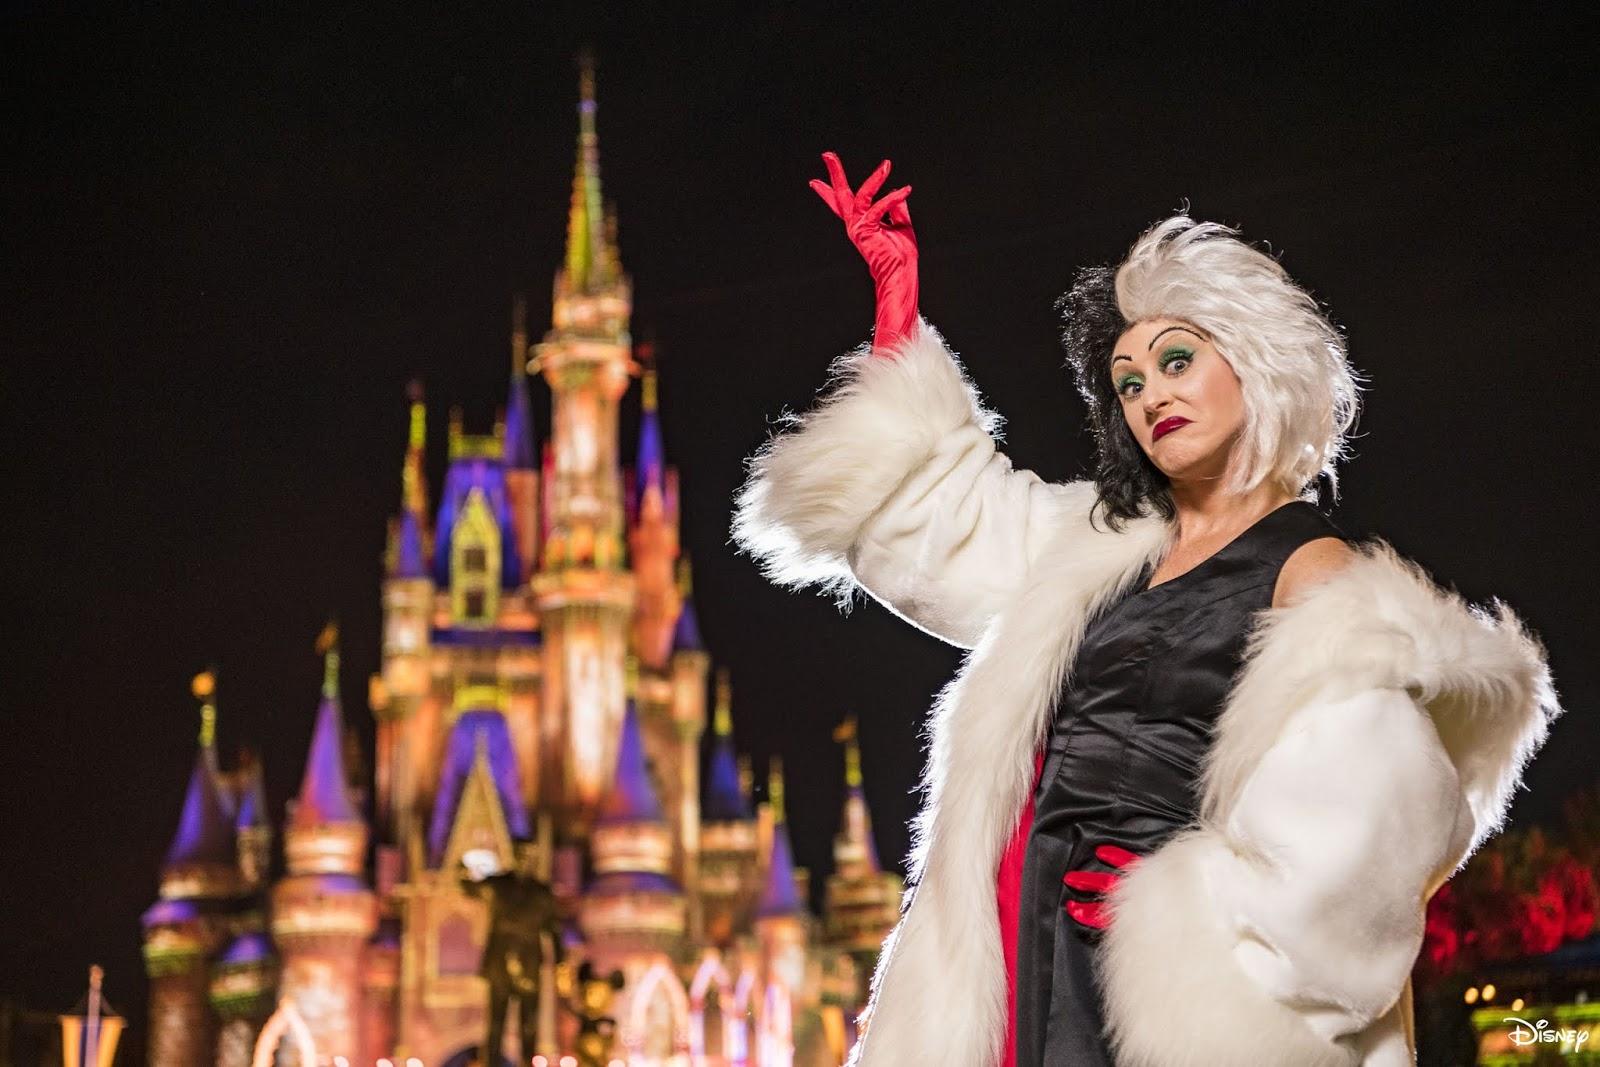 Magic Kingdom Park 2020年「Disney Villains After Hours」活動內容介紹 | Disney Magical Kingdom Blog